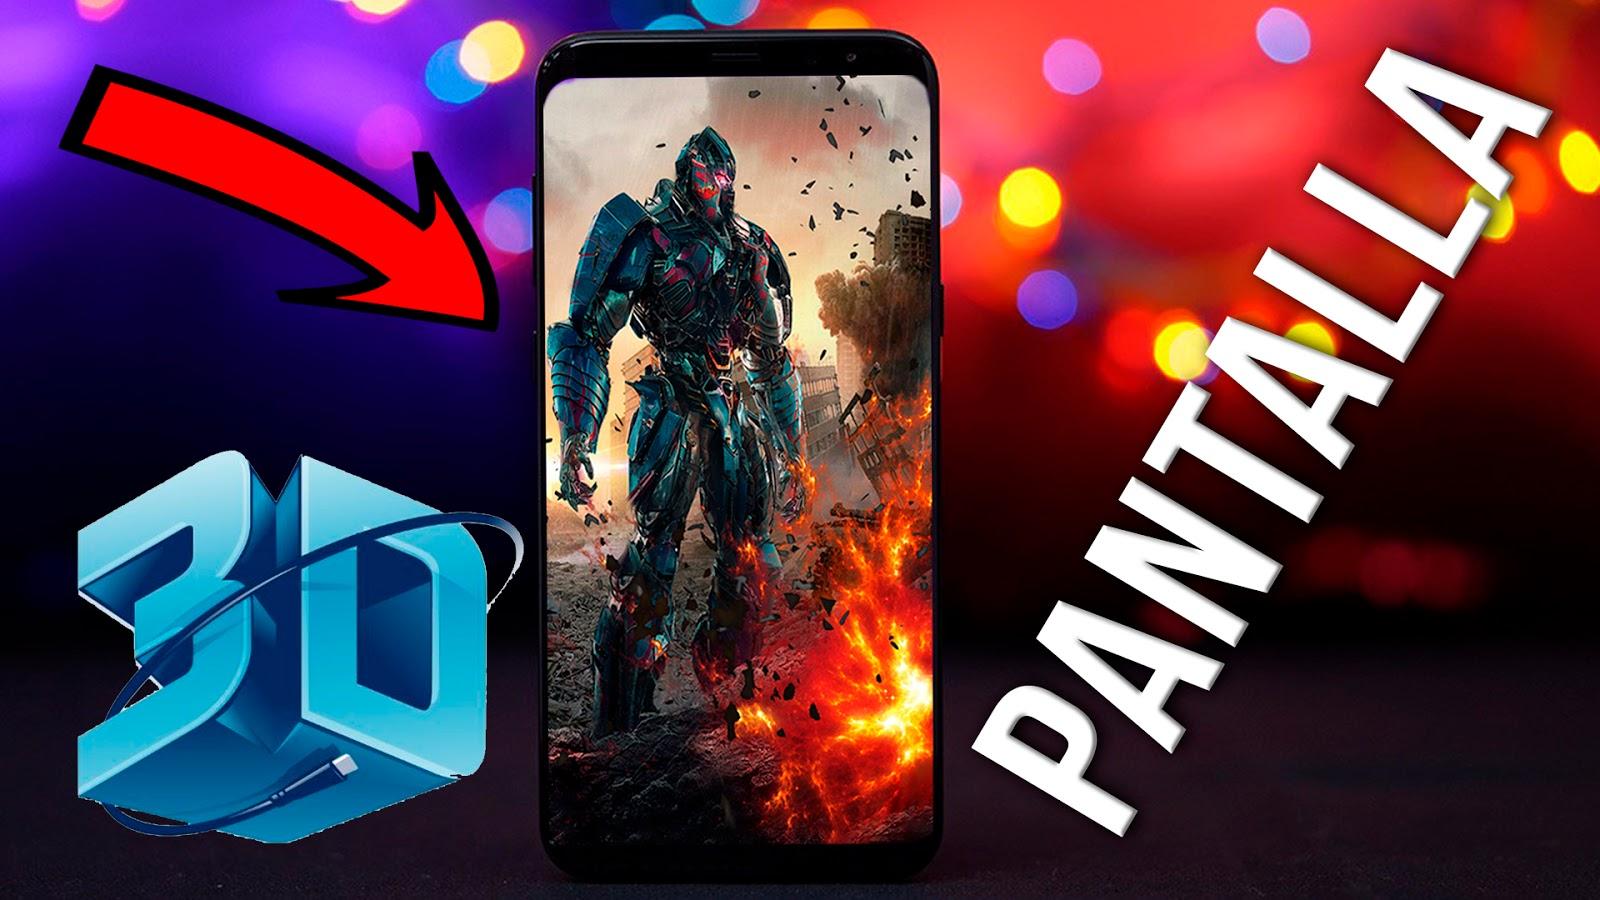 Pantalla 3d Para Cualquier TelÉfono Android: Pantalla 3D En Cualquier Celular Android Full Hack